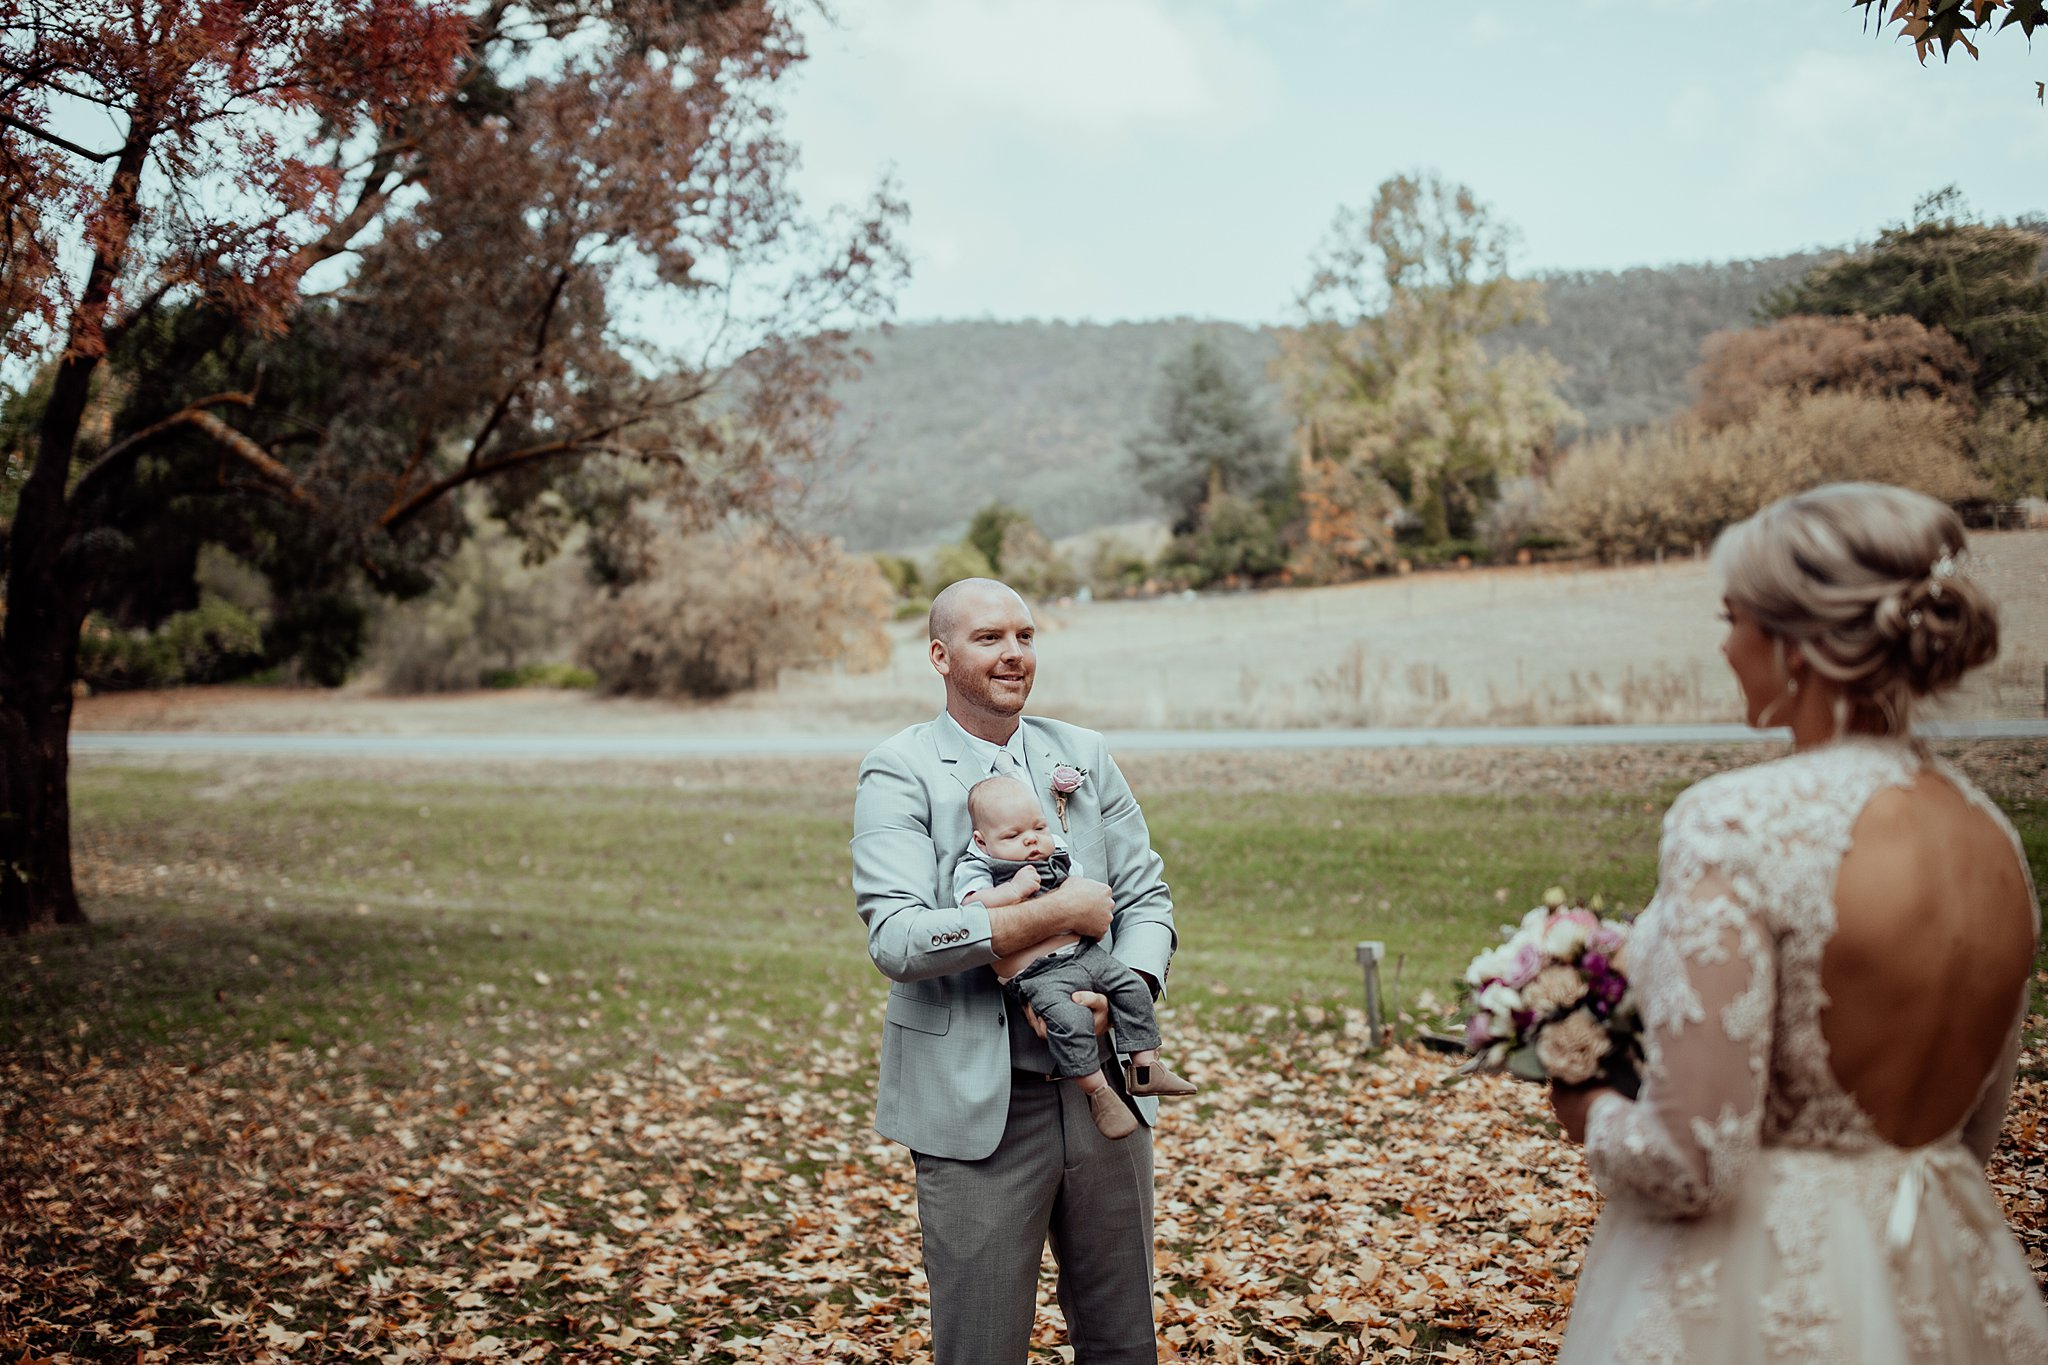 mickalathomas_puremacphotography_weddingphotographer_couplephotographer_Sheppartonphotographer_3410.jpg